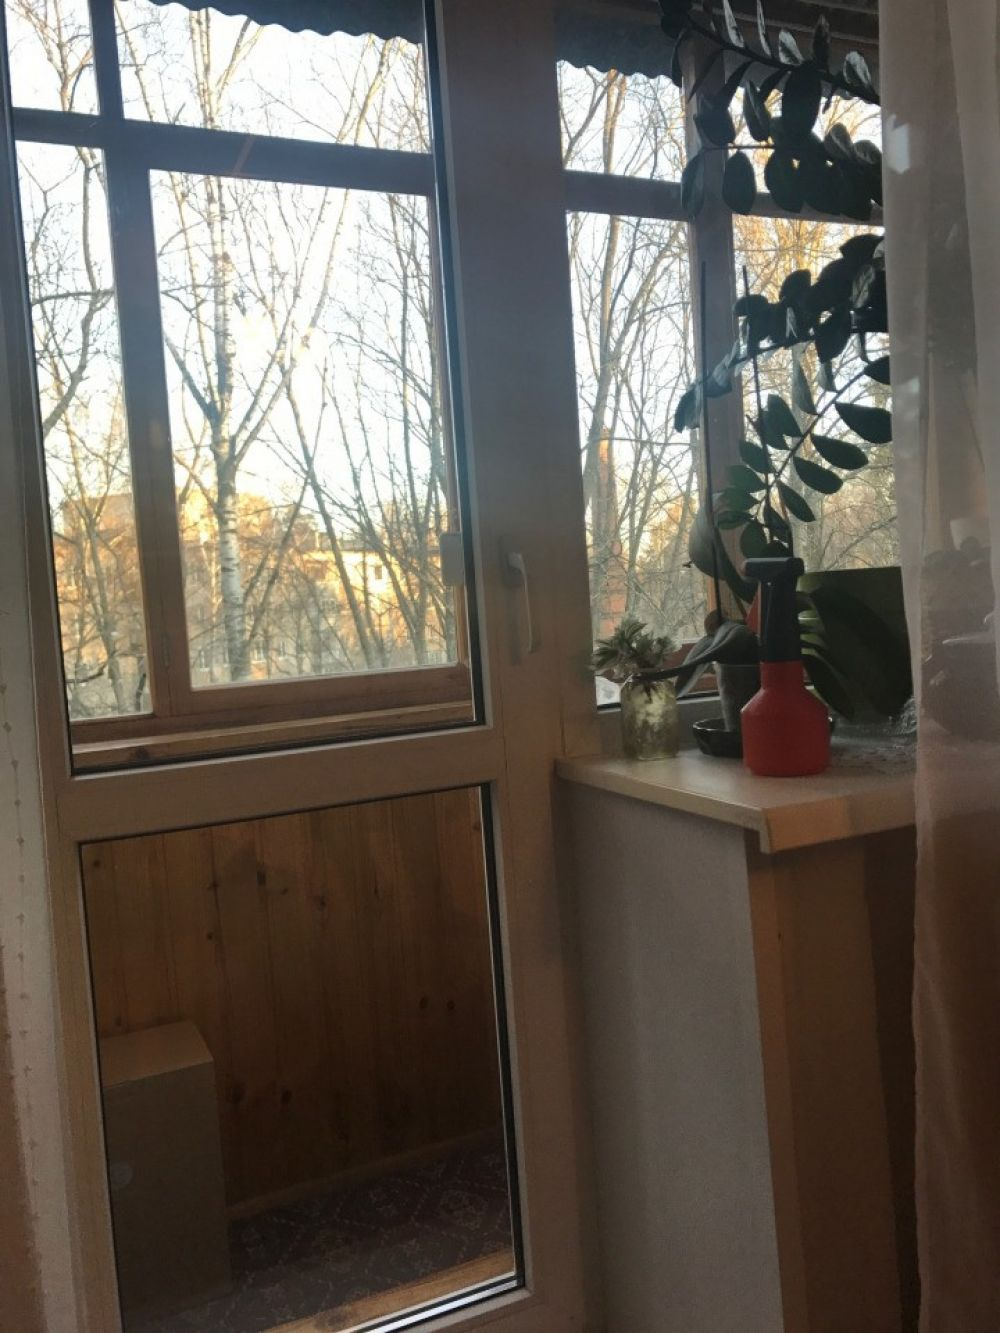 Однокомнатная квартира г. Пушкино ул.Маяковског д.5, фото 4